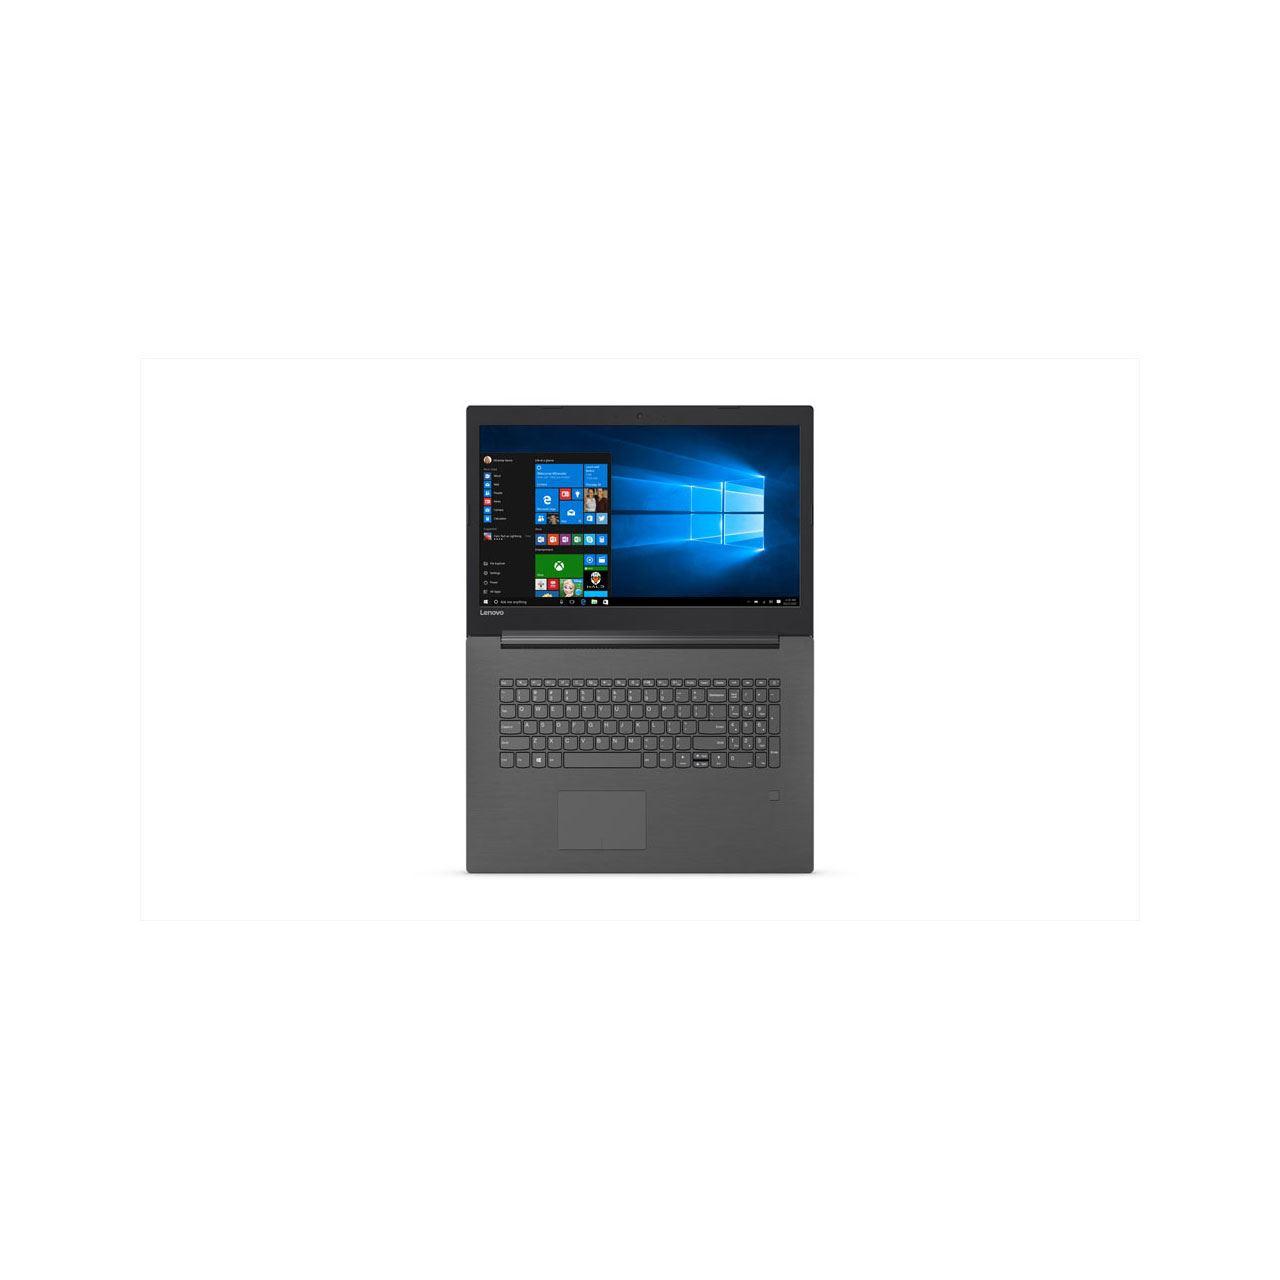 Notebook 173 4394cm Lenovo V320 I5 7400 2x4gb Notebooks Home Gt Integrated Circuits